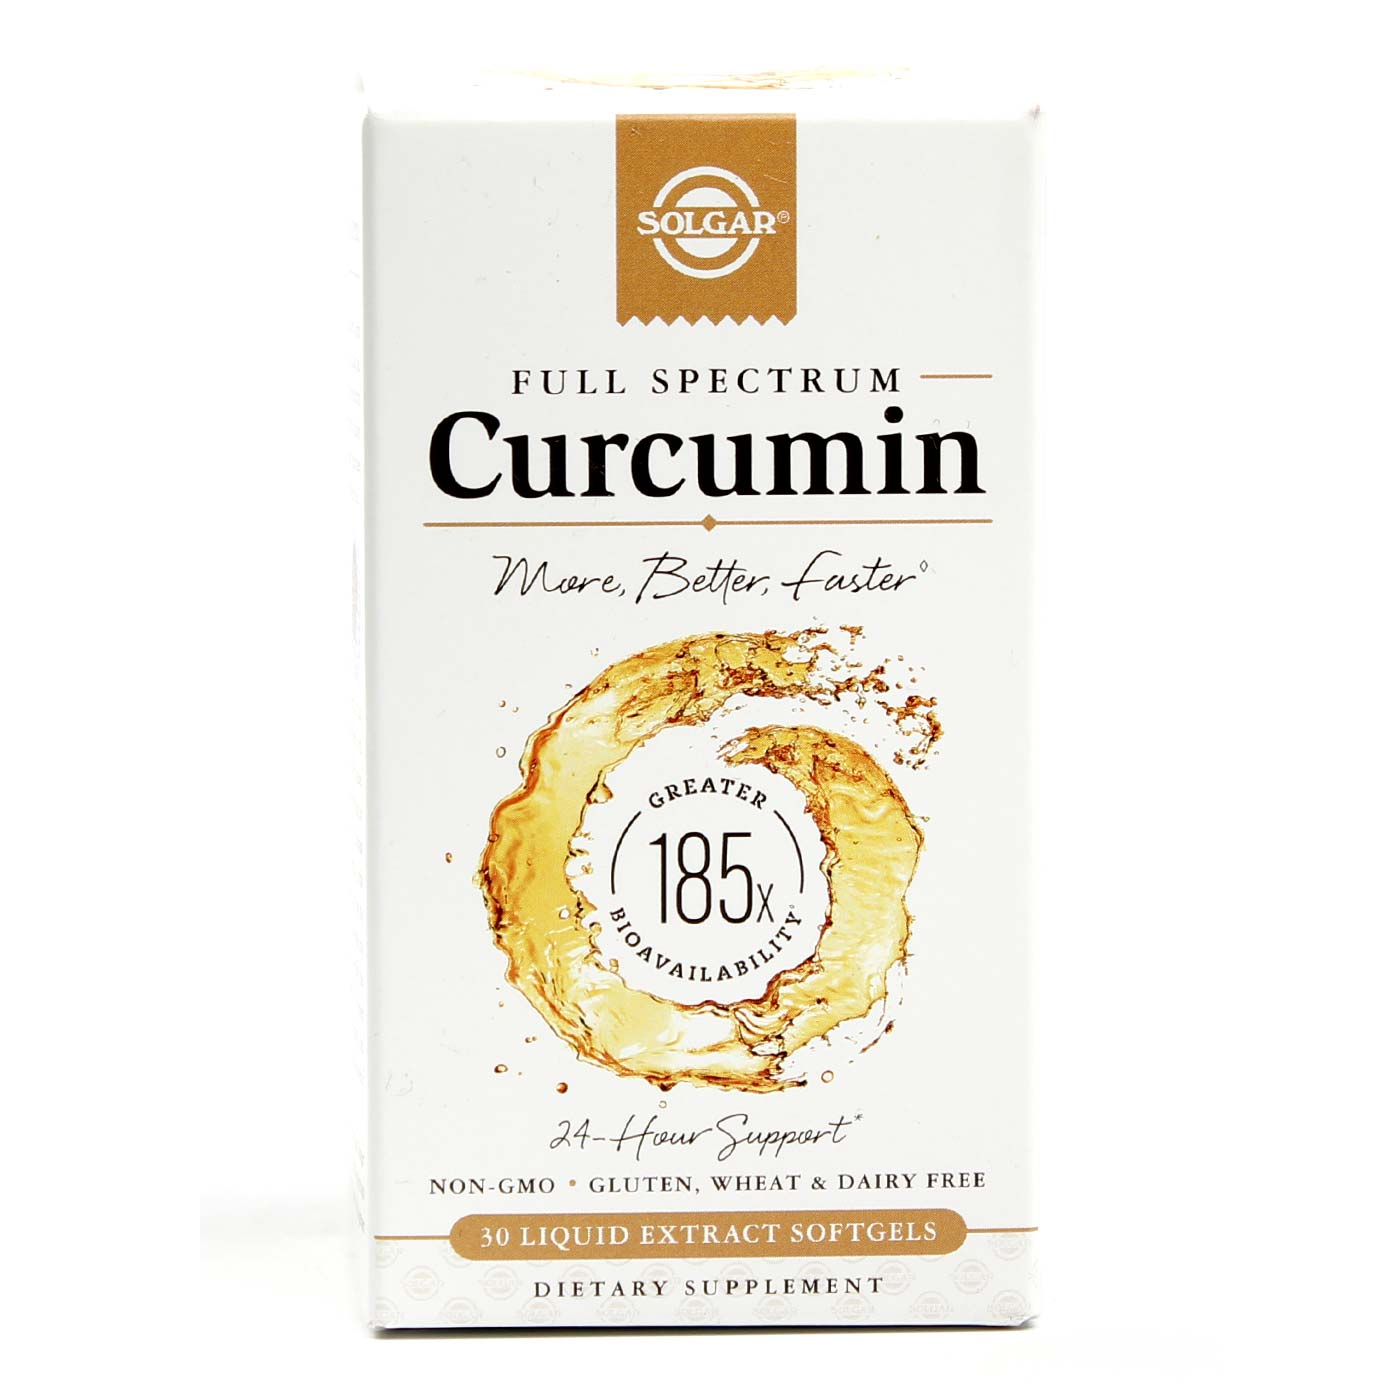 solgar full spectrum curcumin   30 liquid extract softgels   evitamins